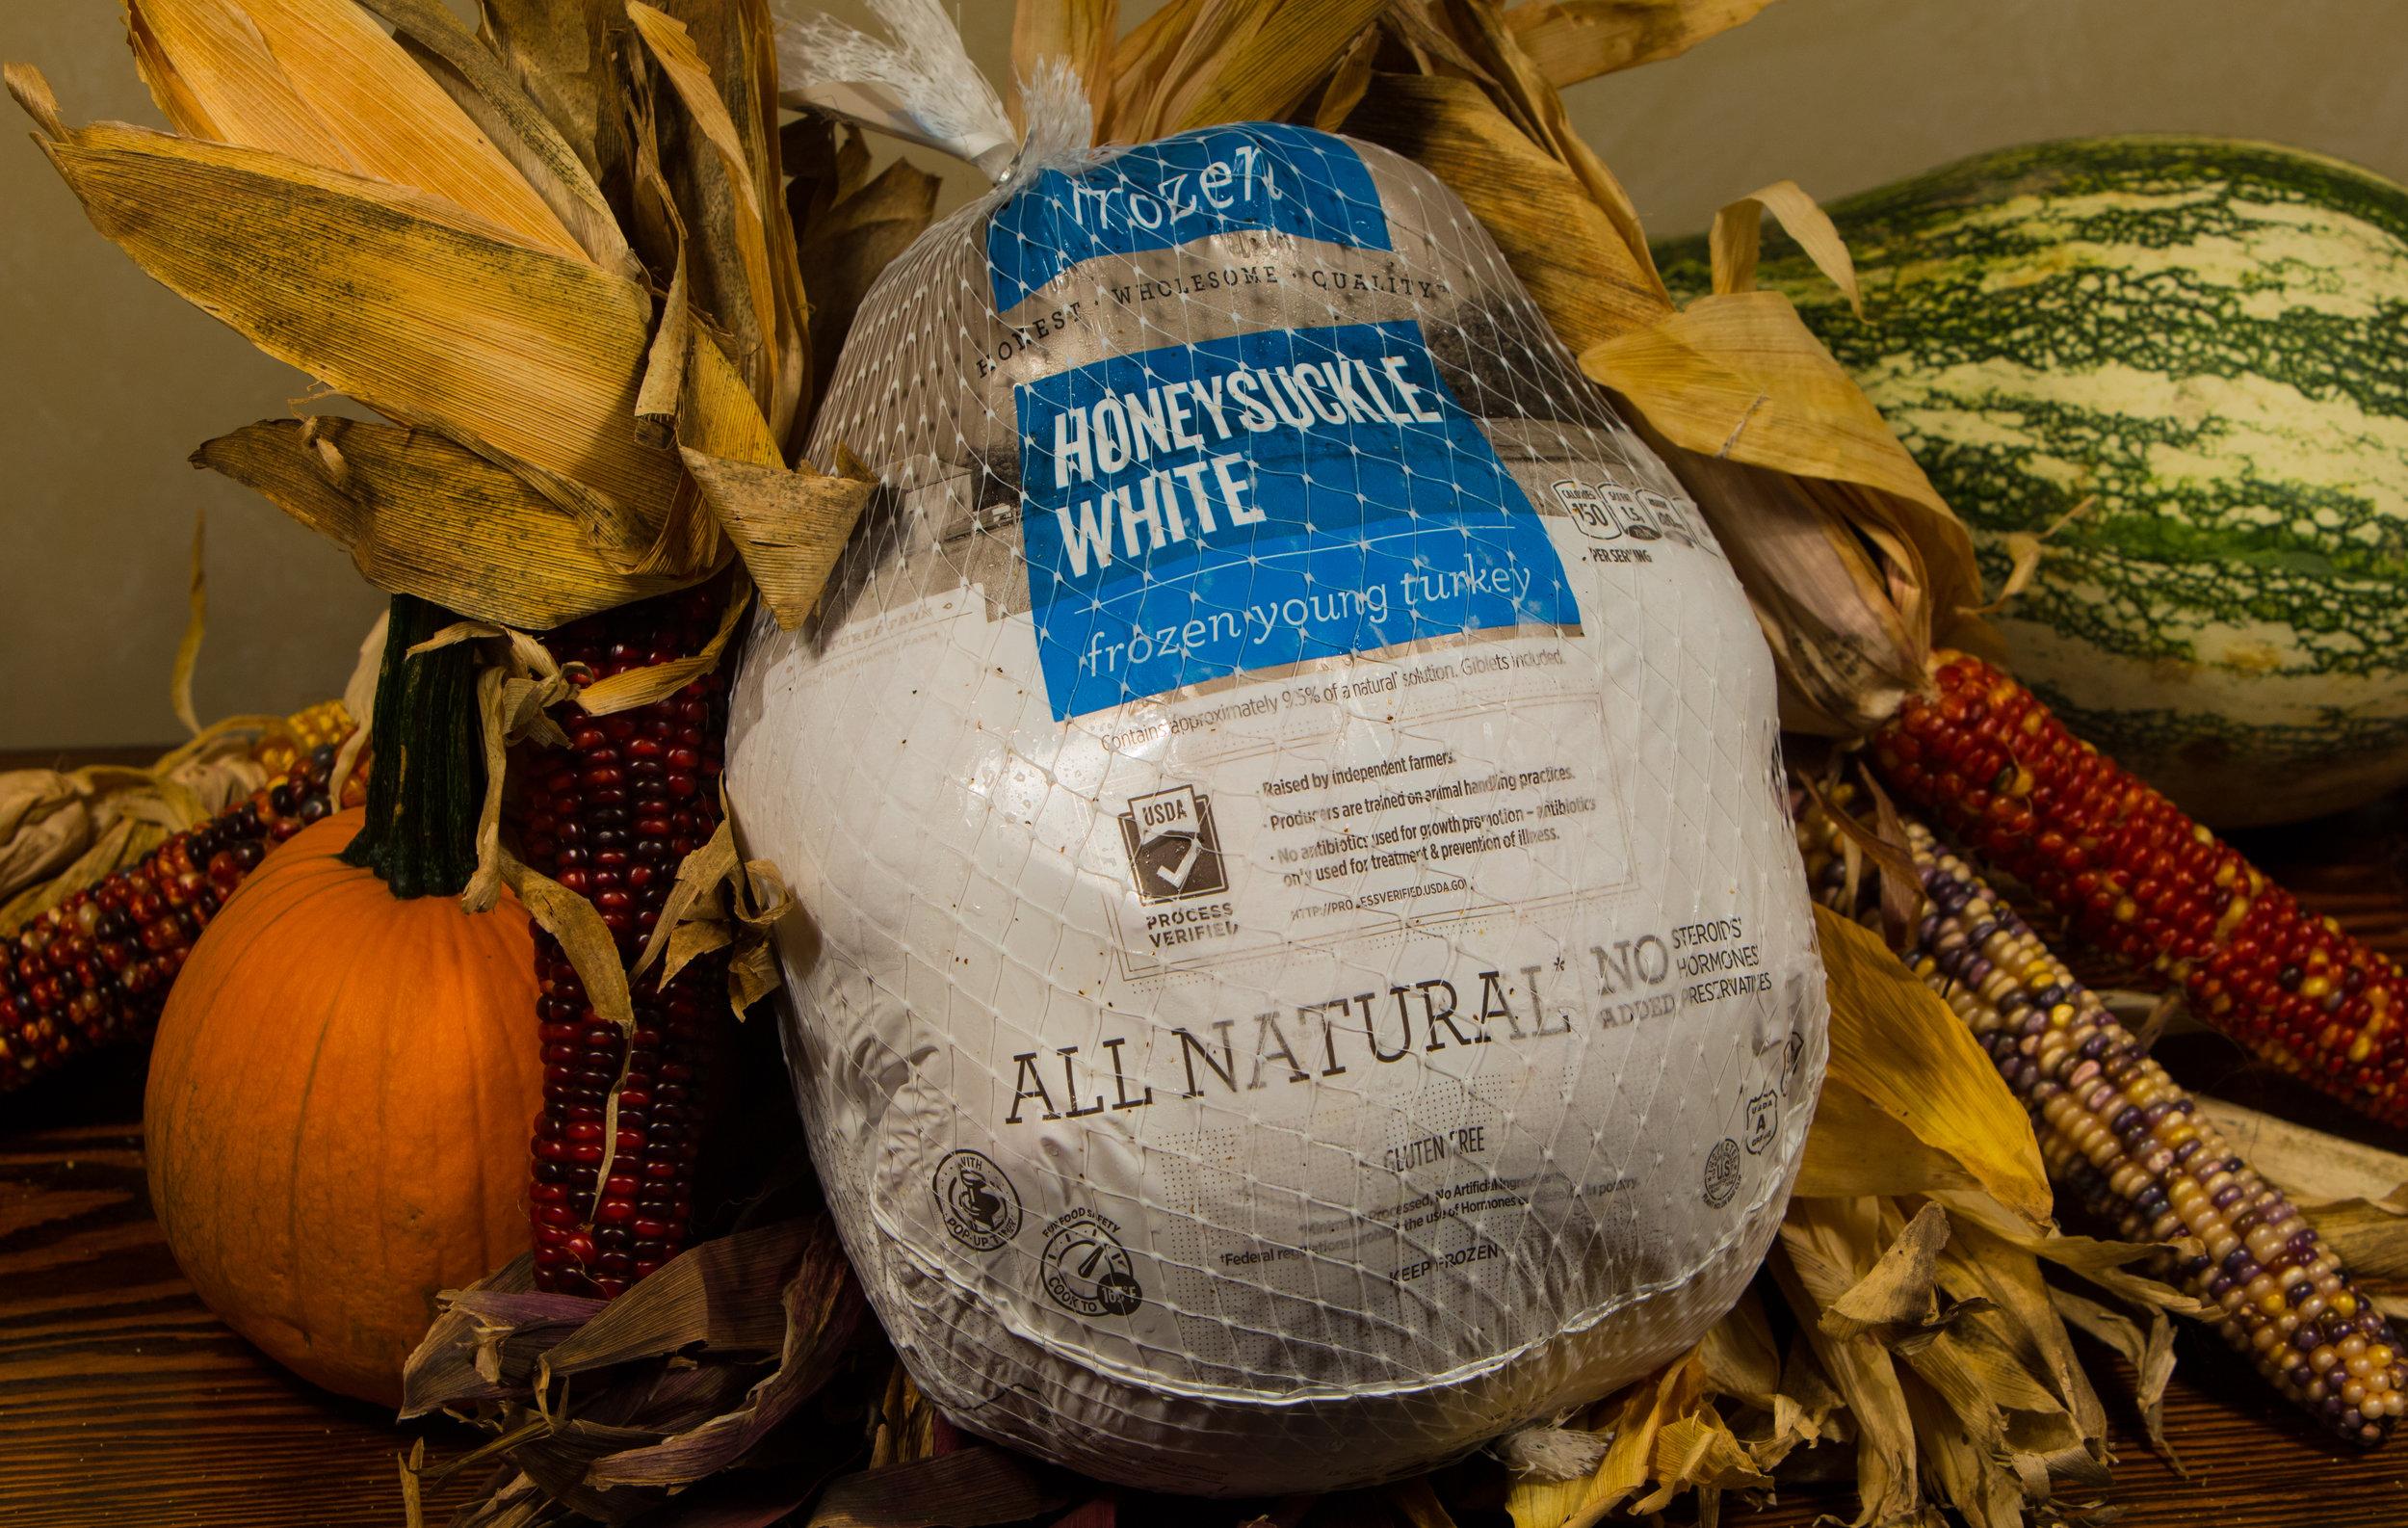 All Natural HOneysuckle white tom turkey